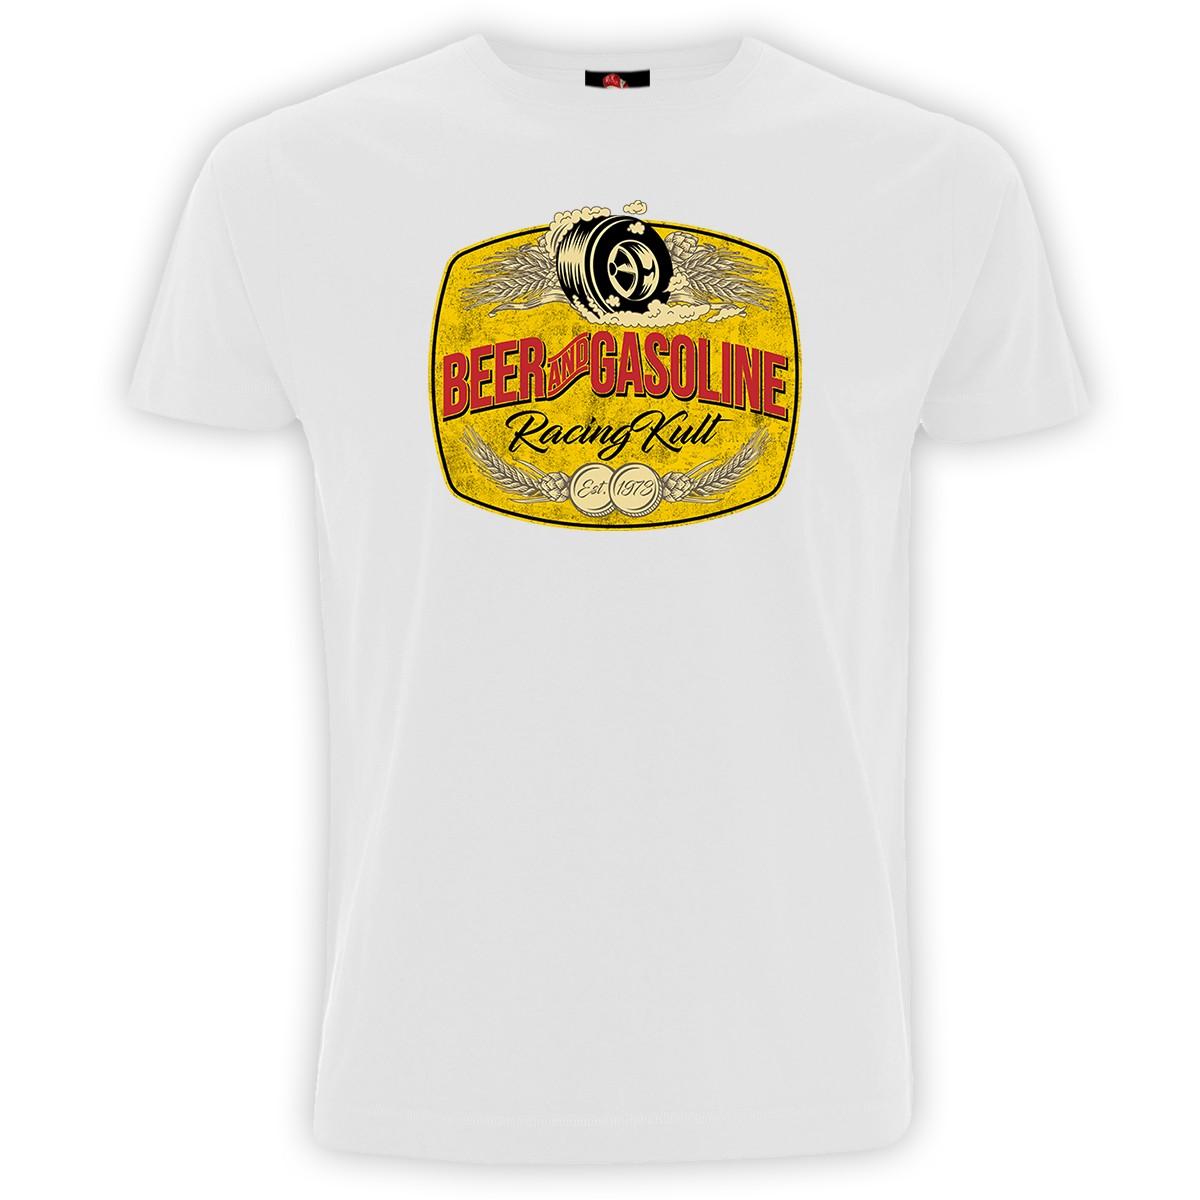 Racing Kult T-Shirt Beer and Gasoline Frontprint